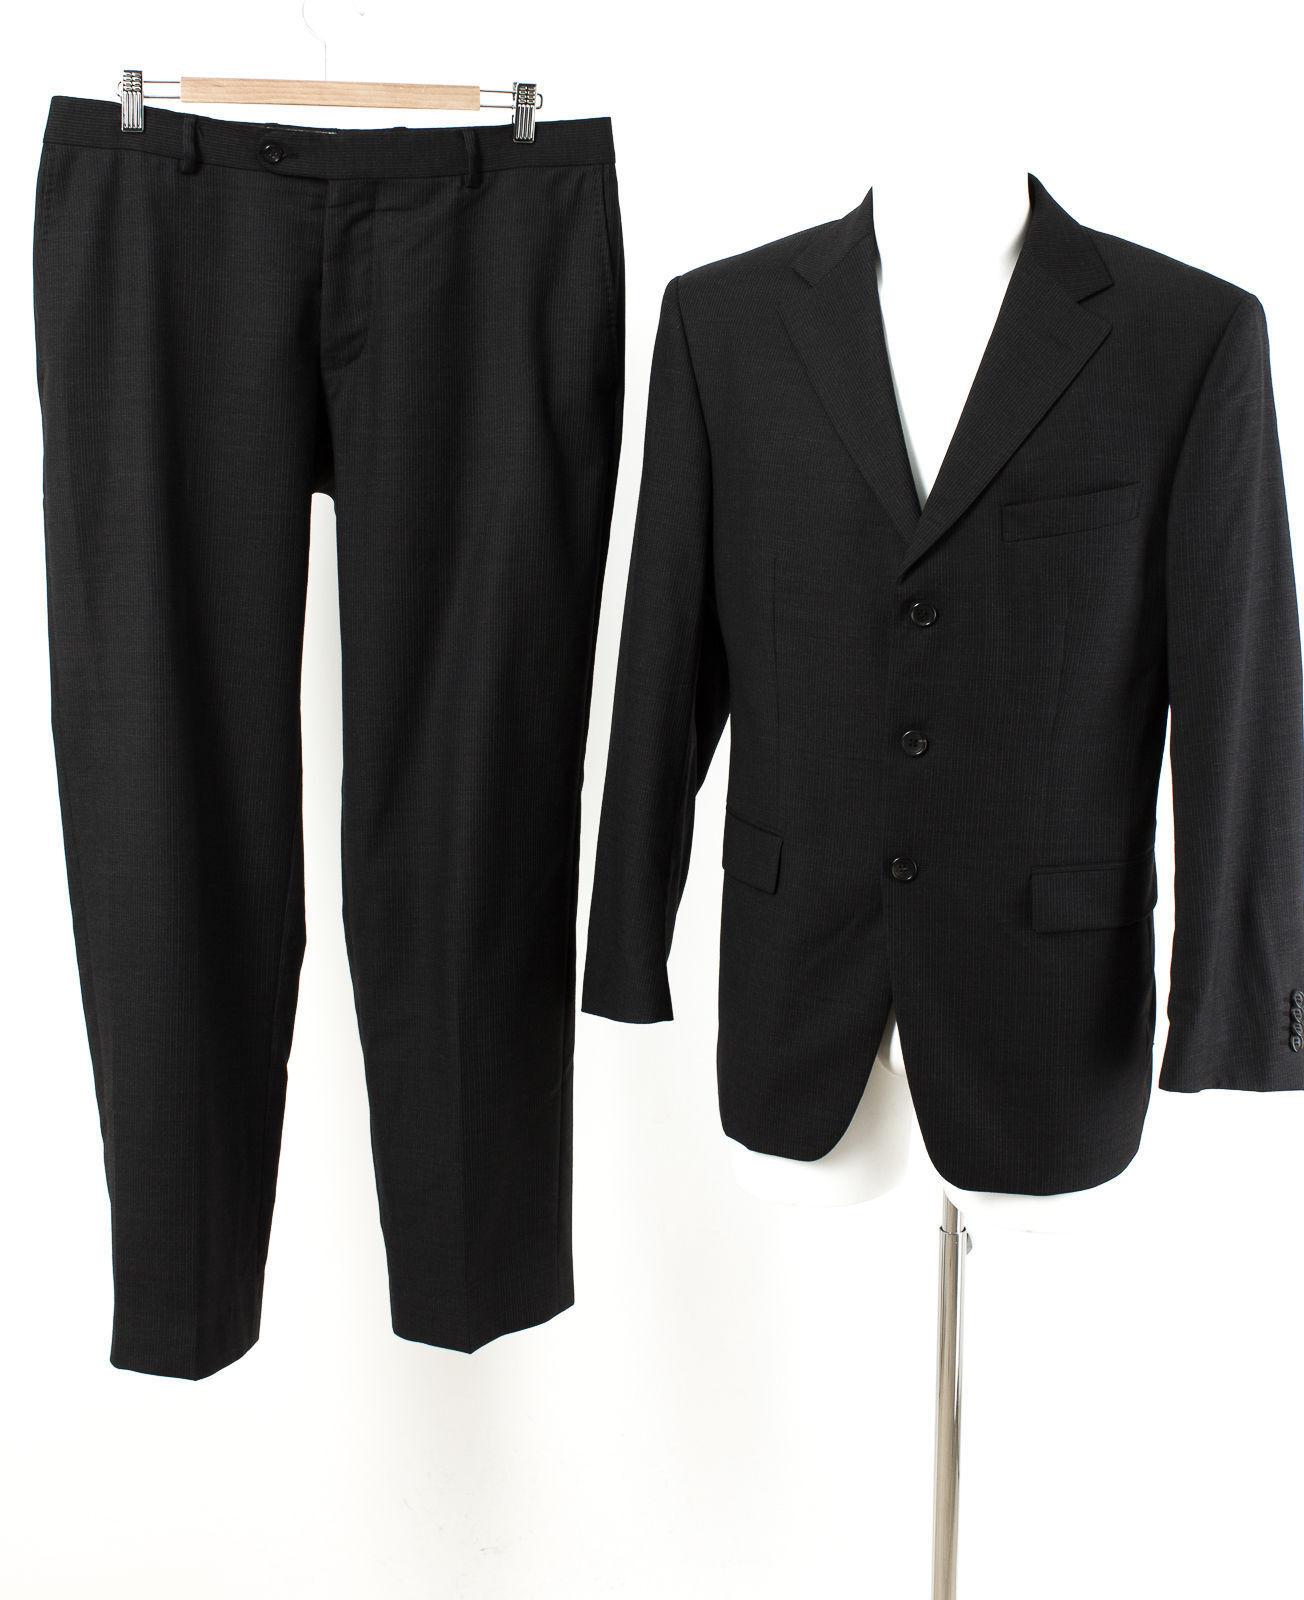 Windsor Anzug Gr. 25 (M Kurz)   Wolle Sakko Hose Geschäft Suit